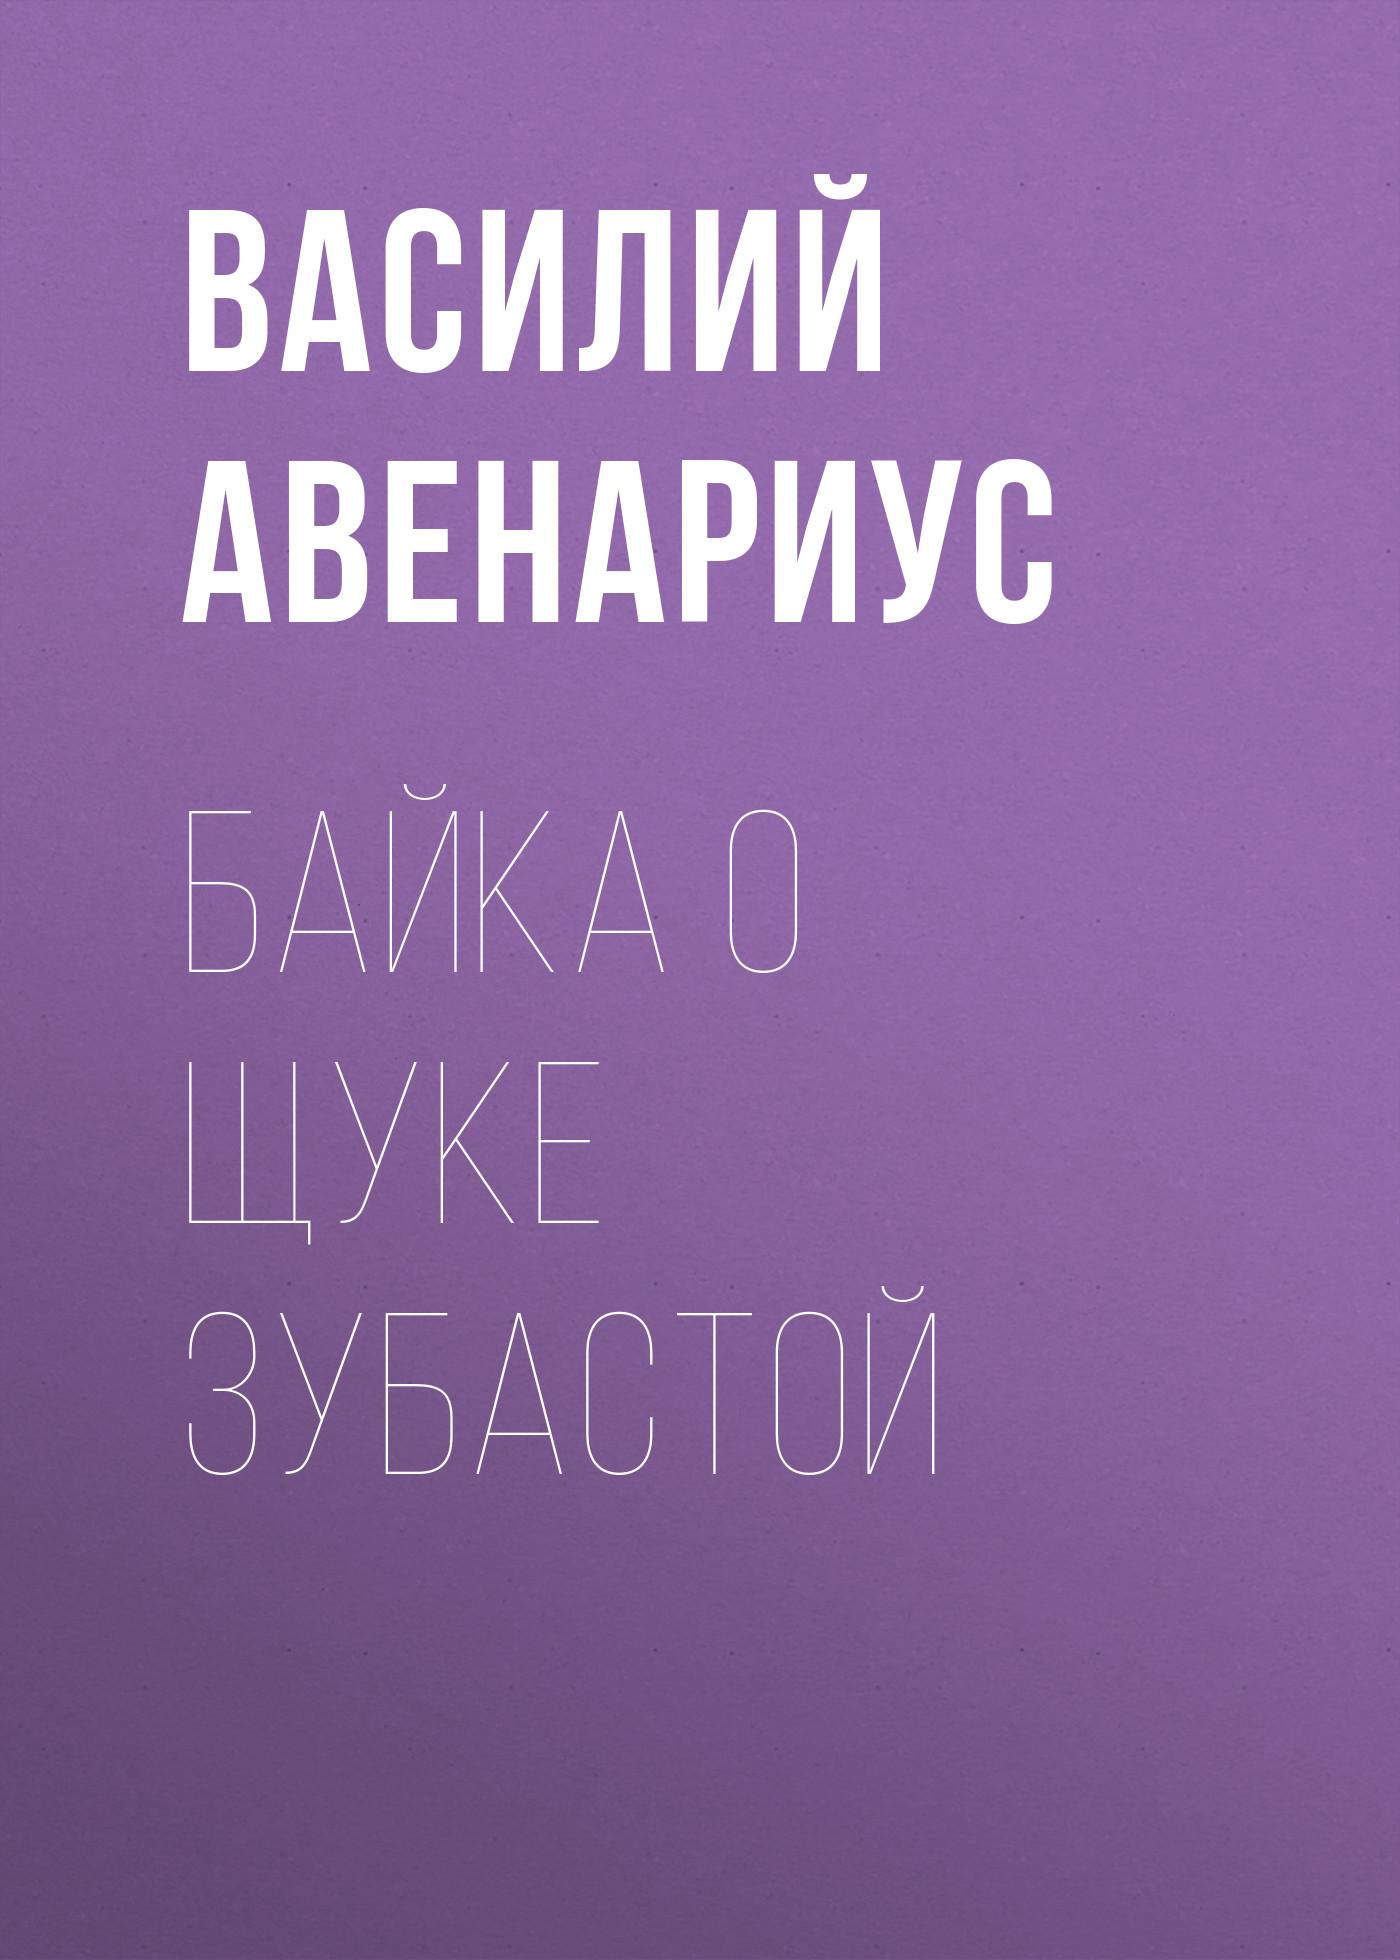 Василий Авенариус Байка о щуке зубастой василий авенариус мальчик зайчик